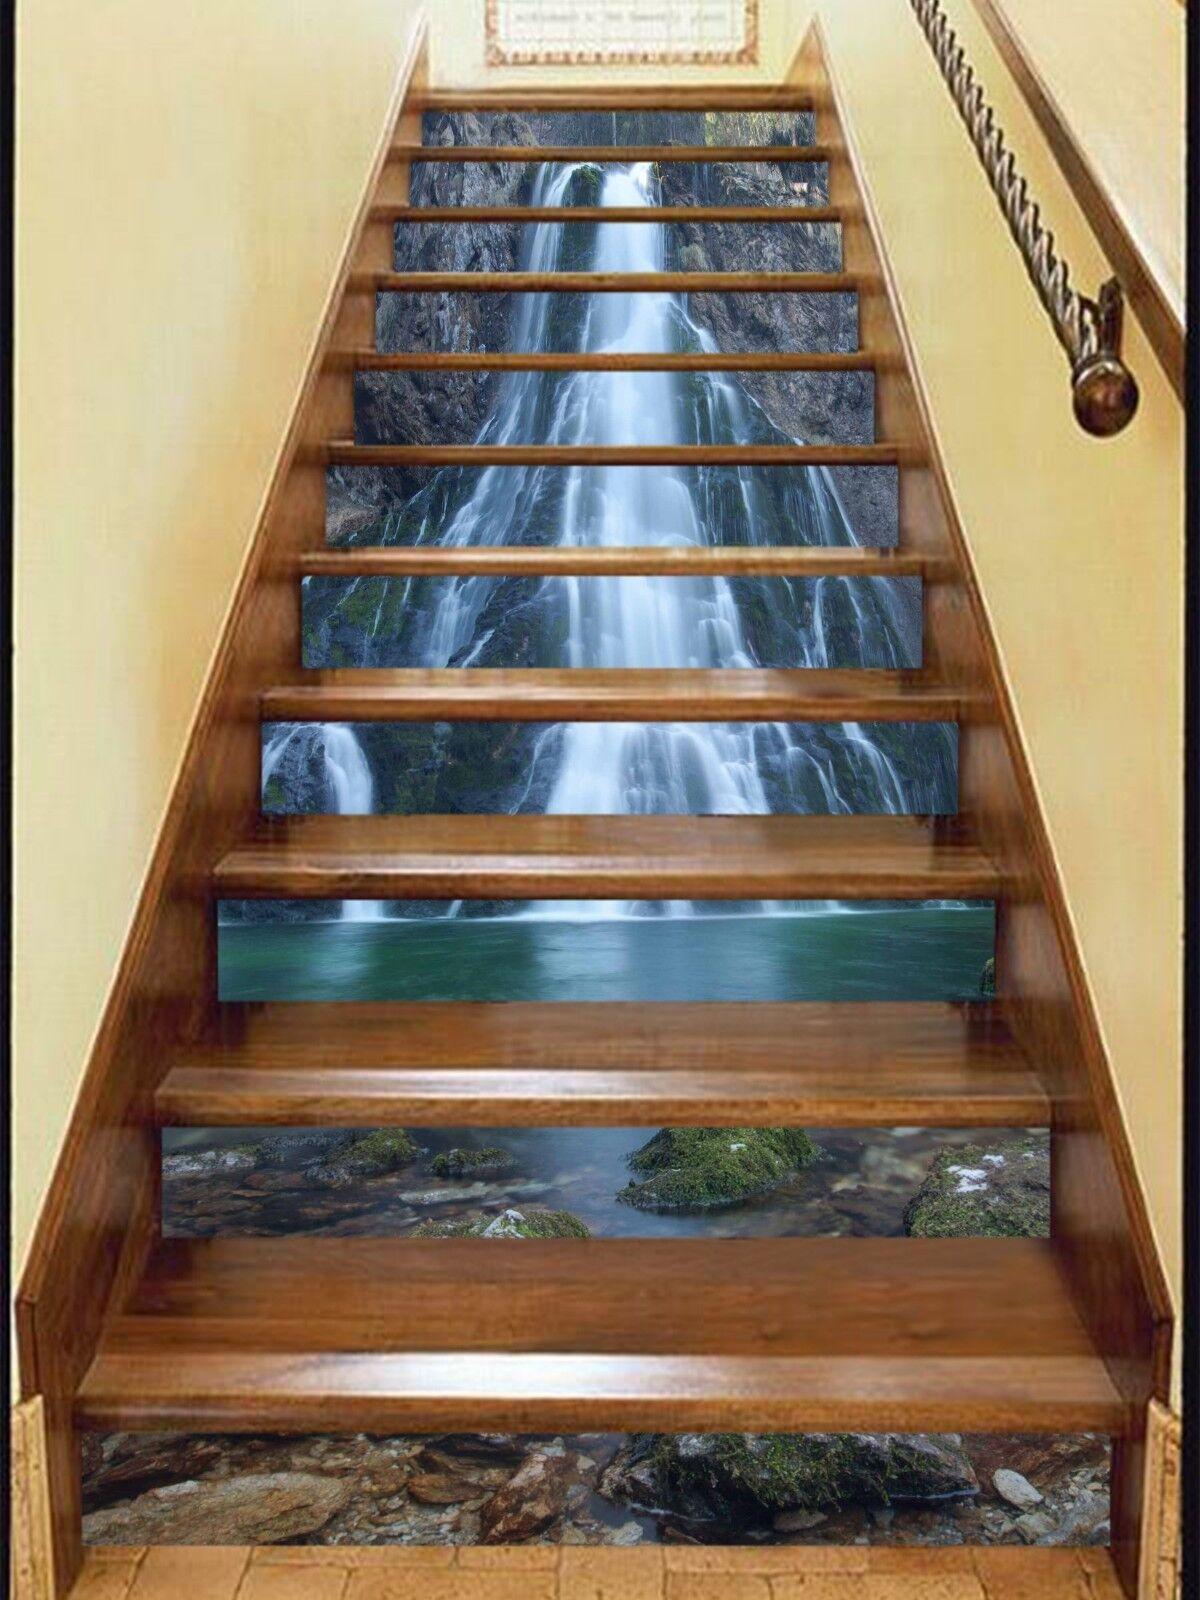 3D Wasserfall 3941 Stair Risers Dekoration Fototapete Vinyl Aufkleber Tapete DE